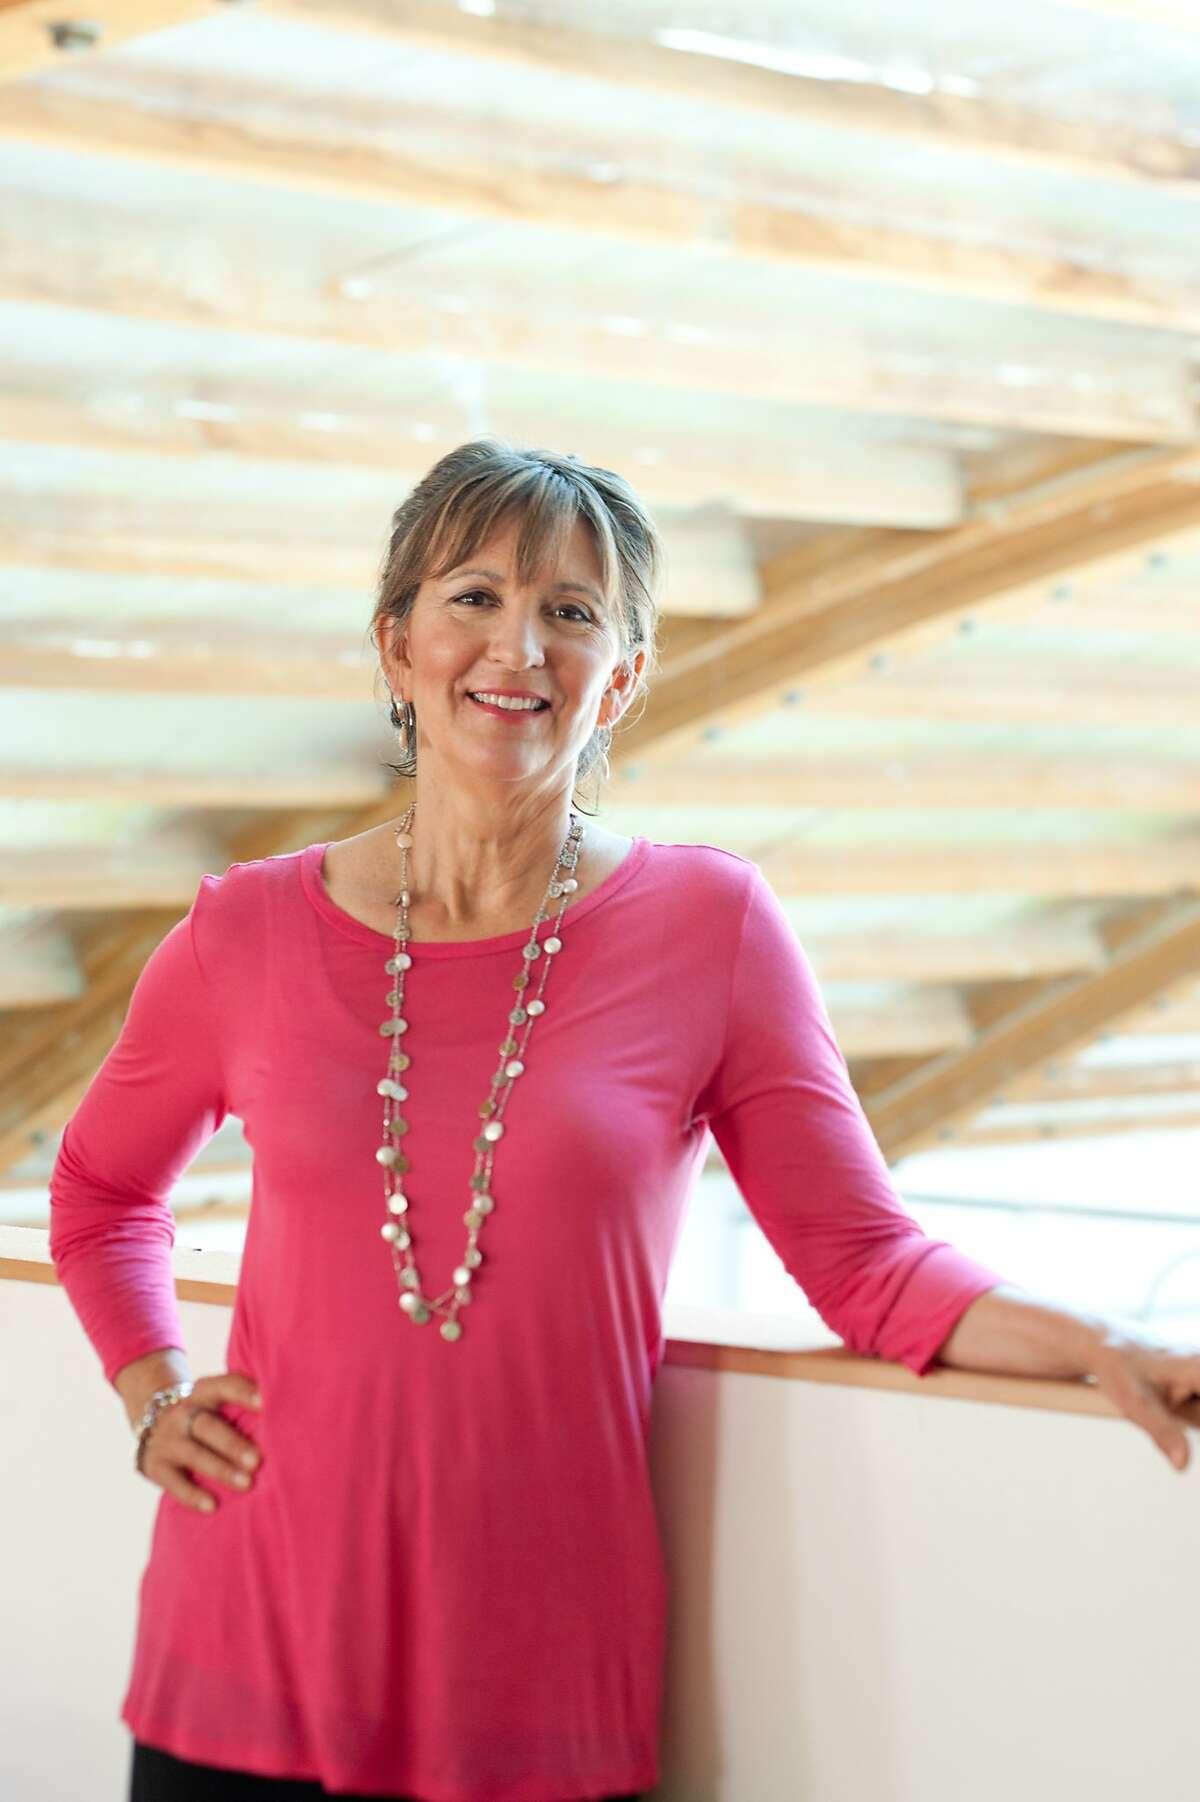 Juice Beauty founder Karen Behnke at the headquarters on Wednesday, June 17, 2015, in San Rafael, Calif.